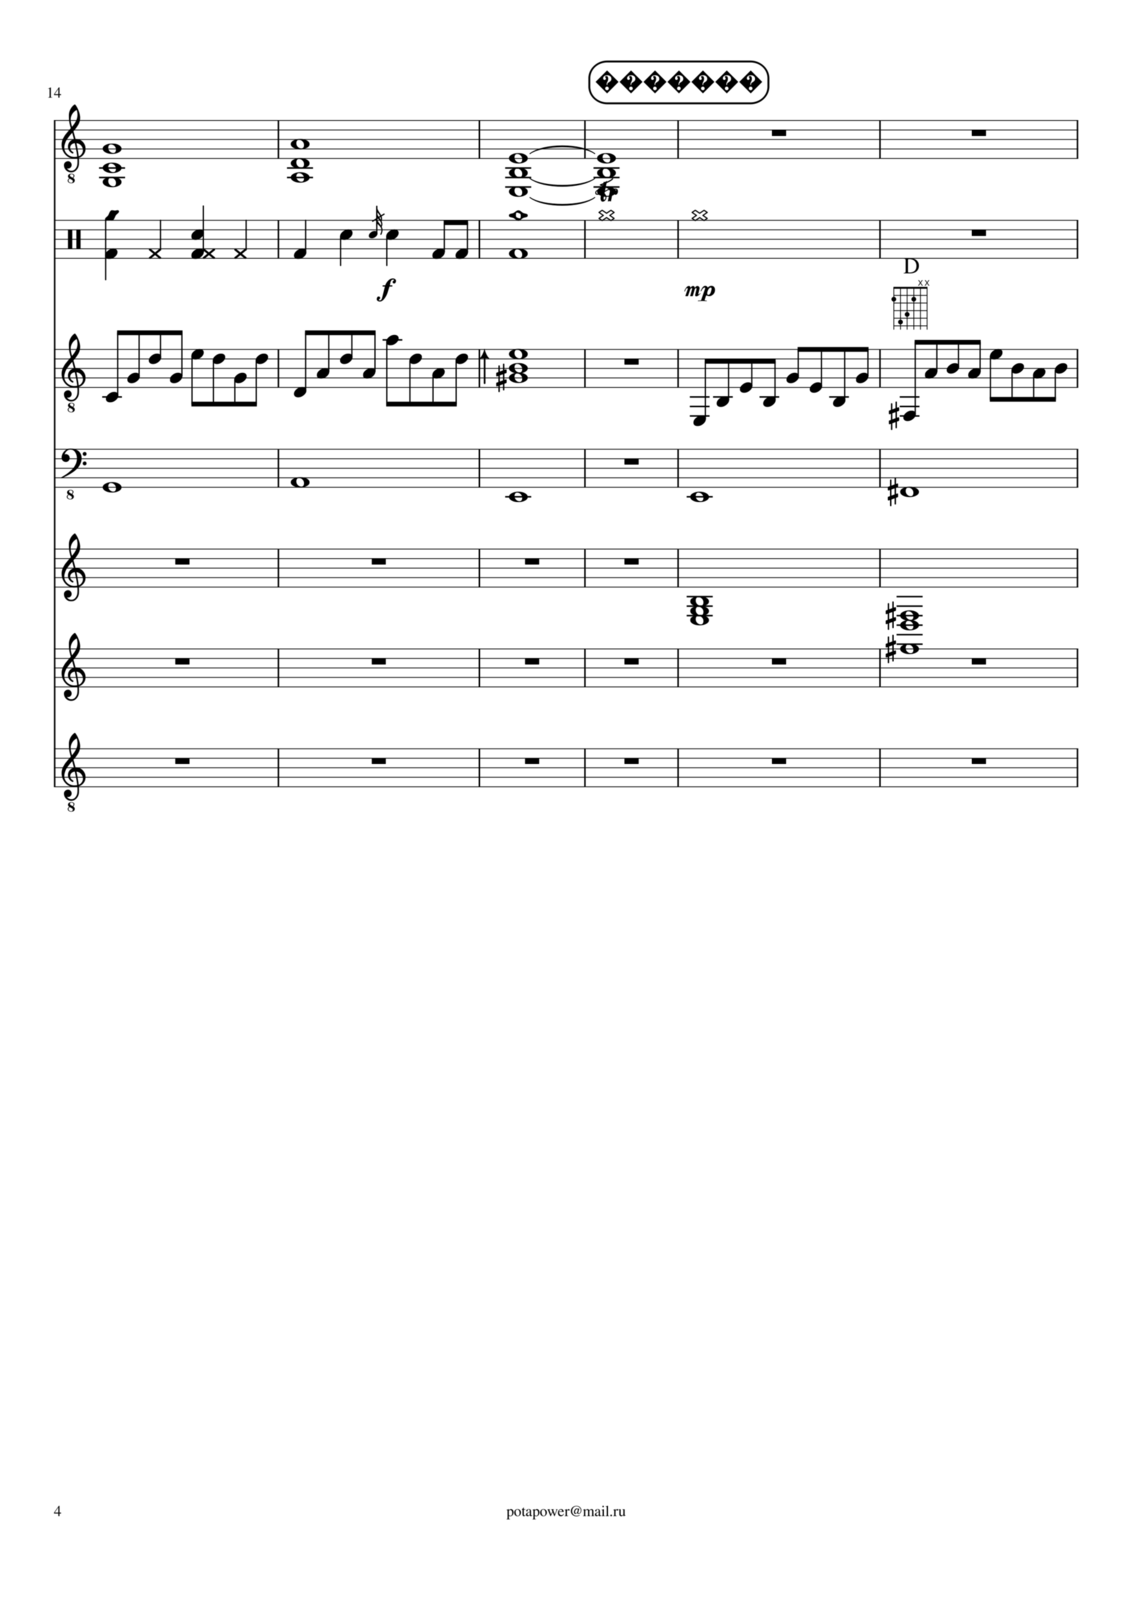 Ten lyubvi slide, Image 4